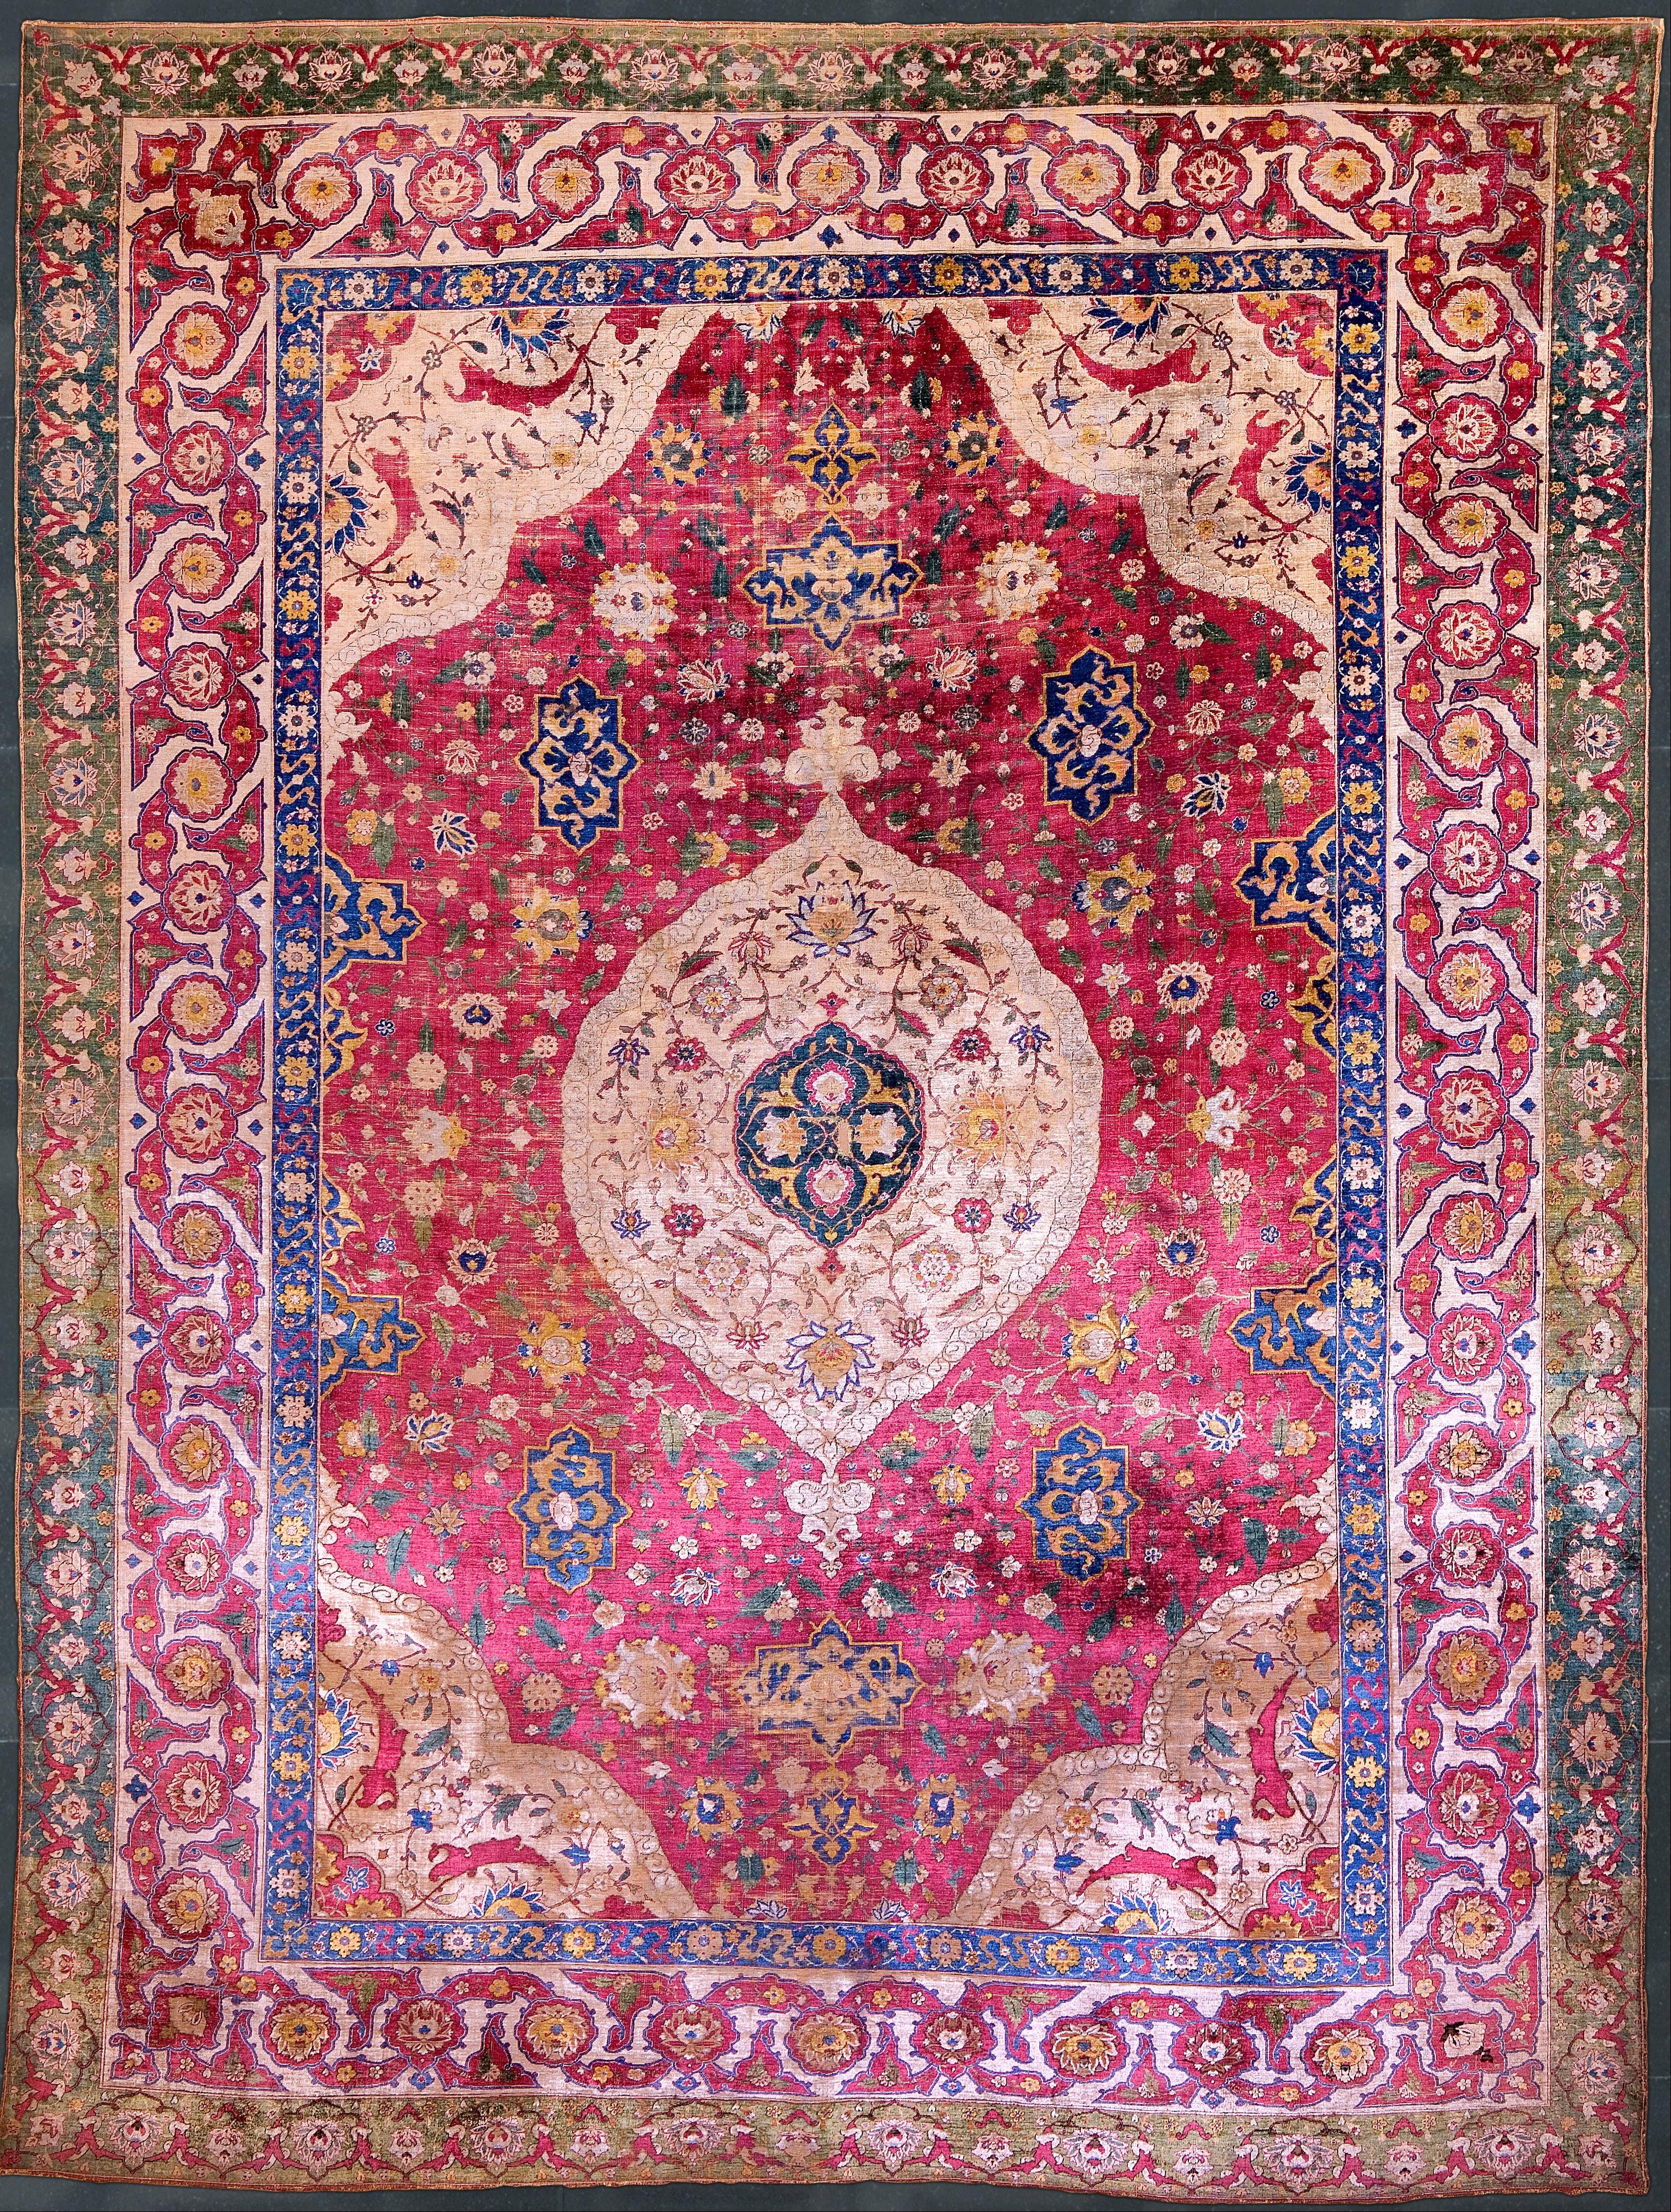 Tapis de soie à petit médaillon Rotschild, Iran, 1540 - 1560 © The Museum of Islamic Art, Qatar